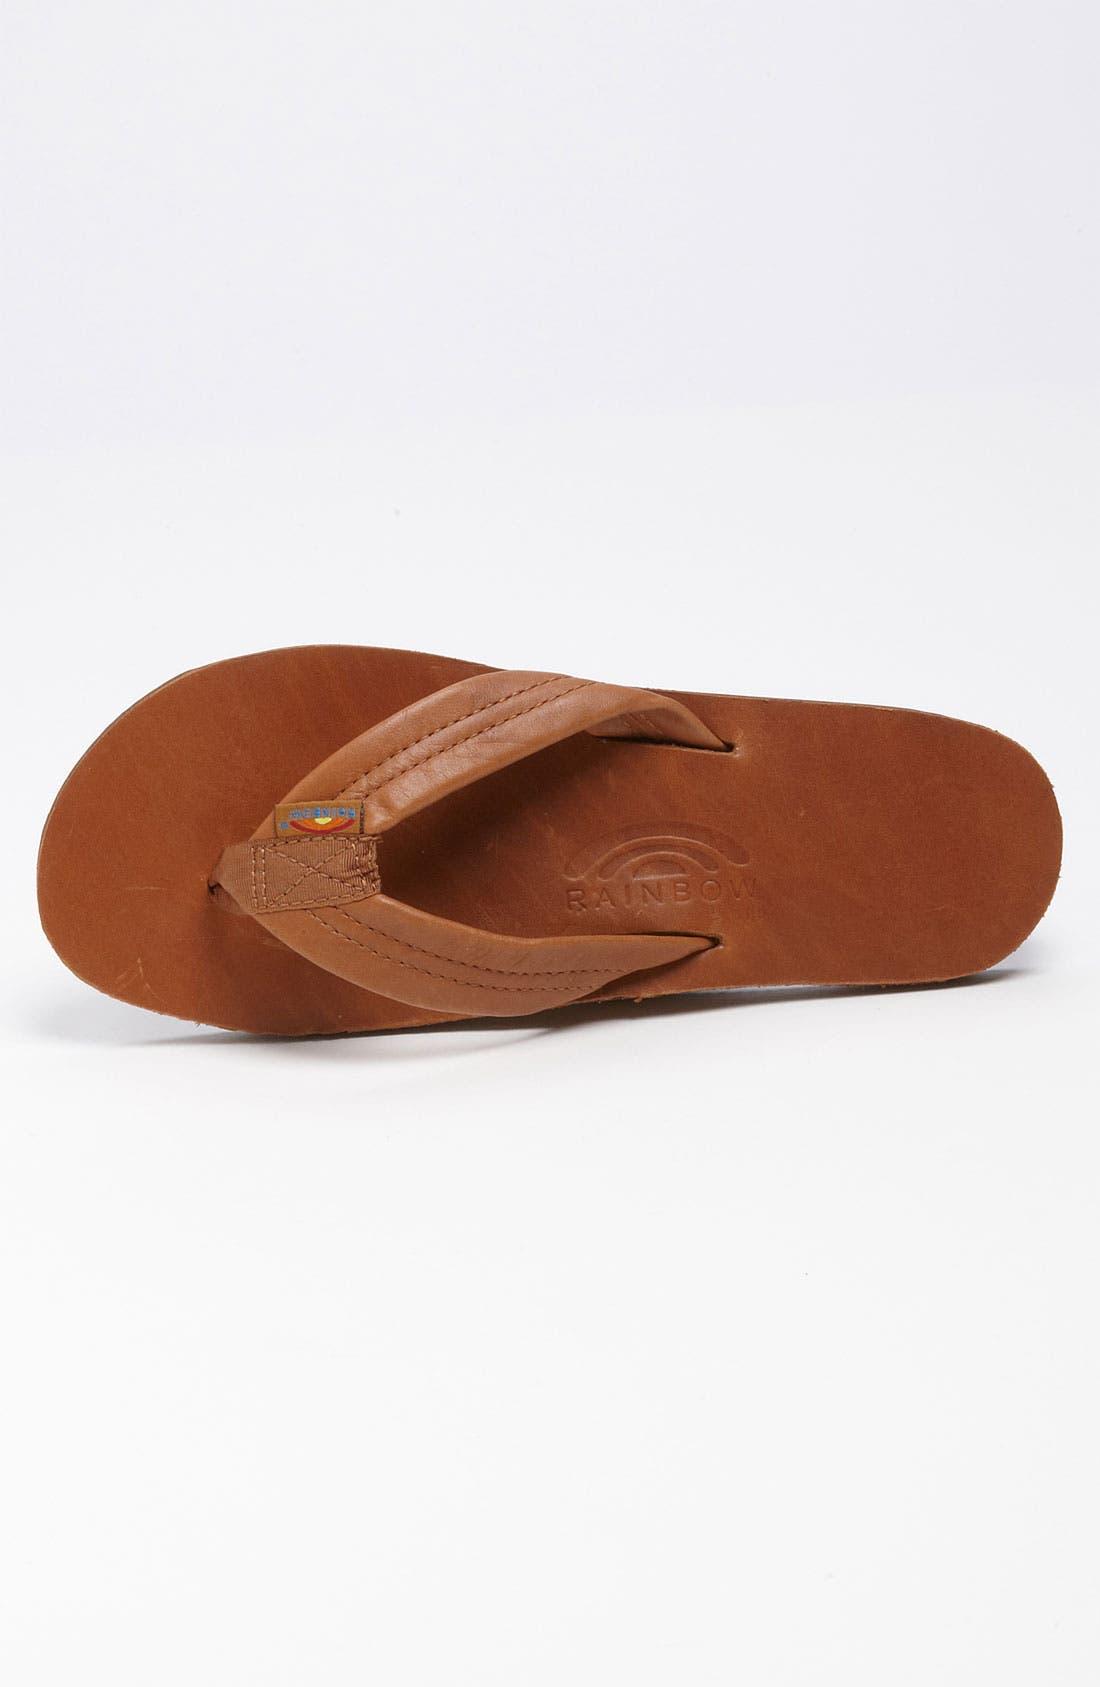 '301Alts' Sandal,                             Alternate thumbnail 3, color,                             TAN/ BROWN